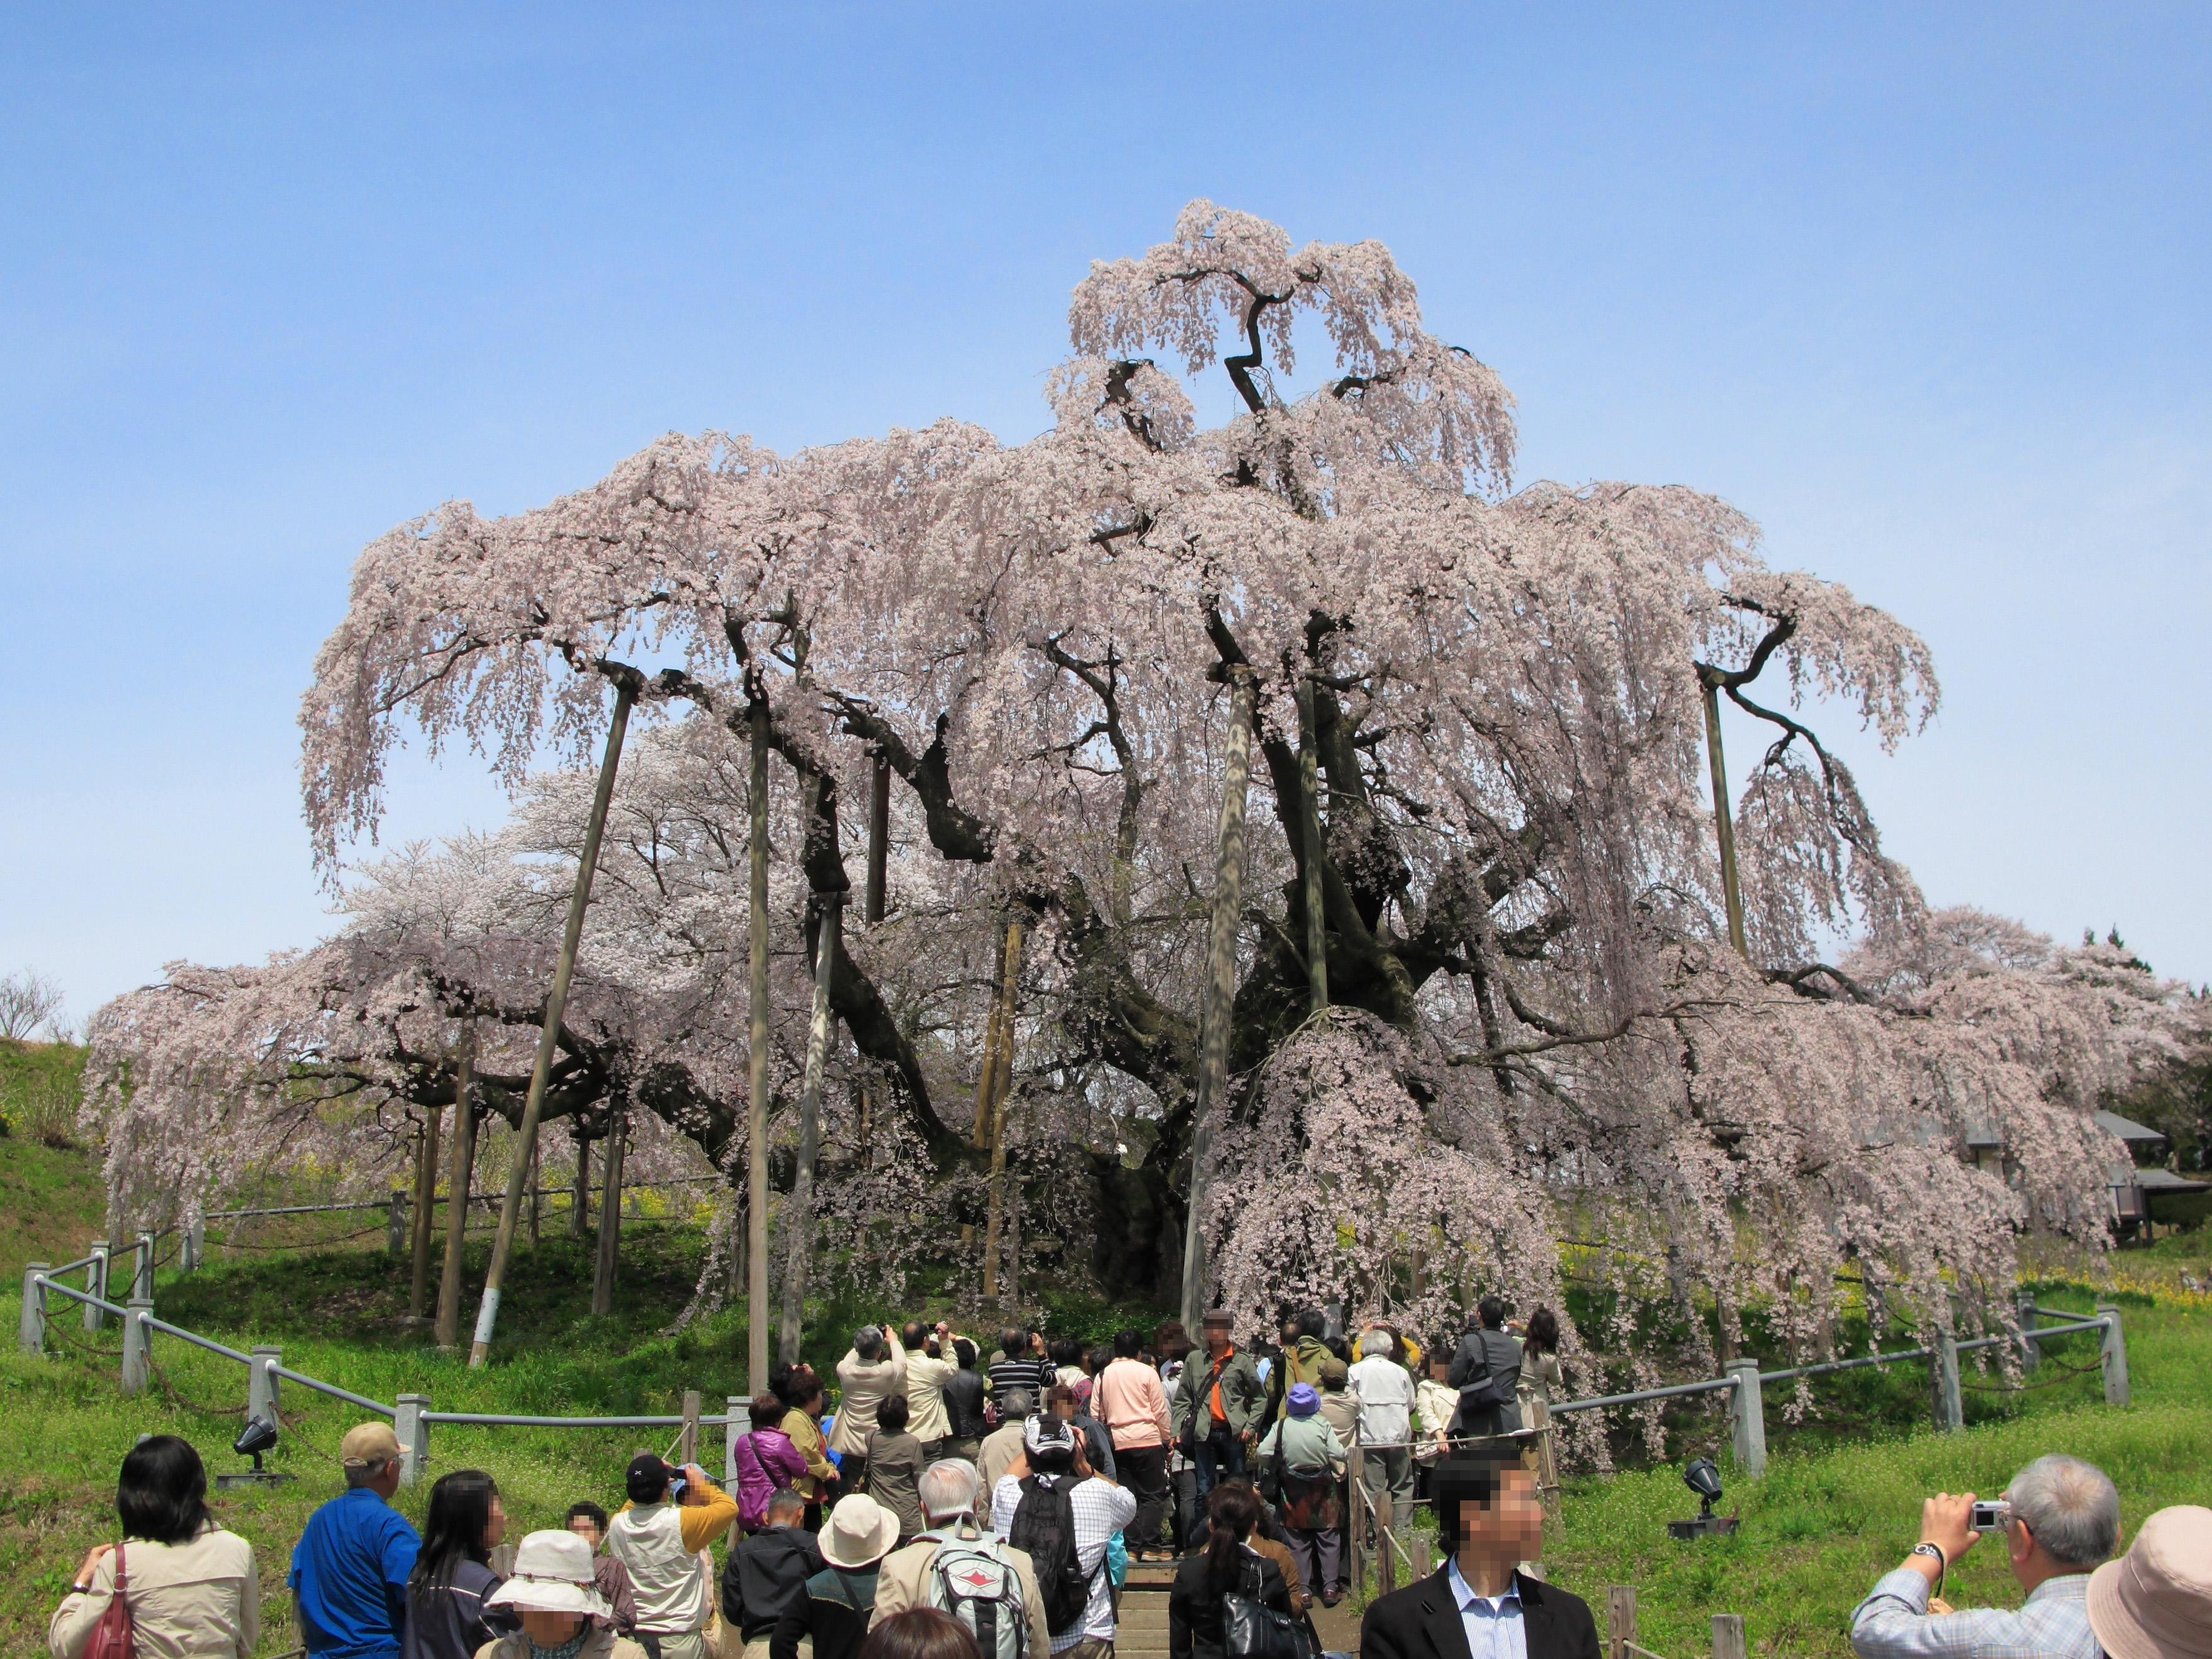 https://upload.wikimedia.org/wikipedia/commons/8/8f/Miharu_Miharu-Takizakura_Front_1.jpg